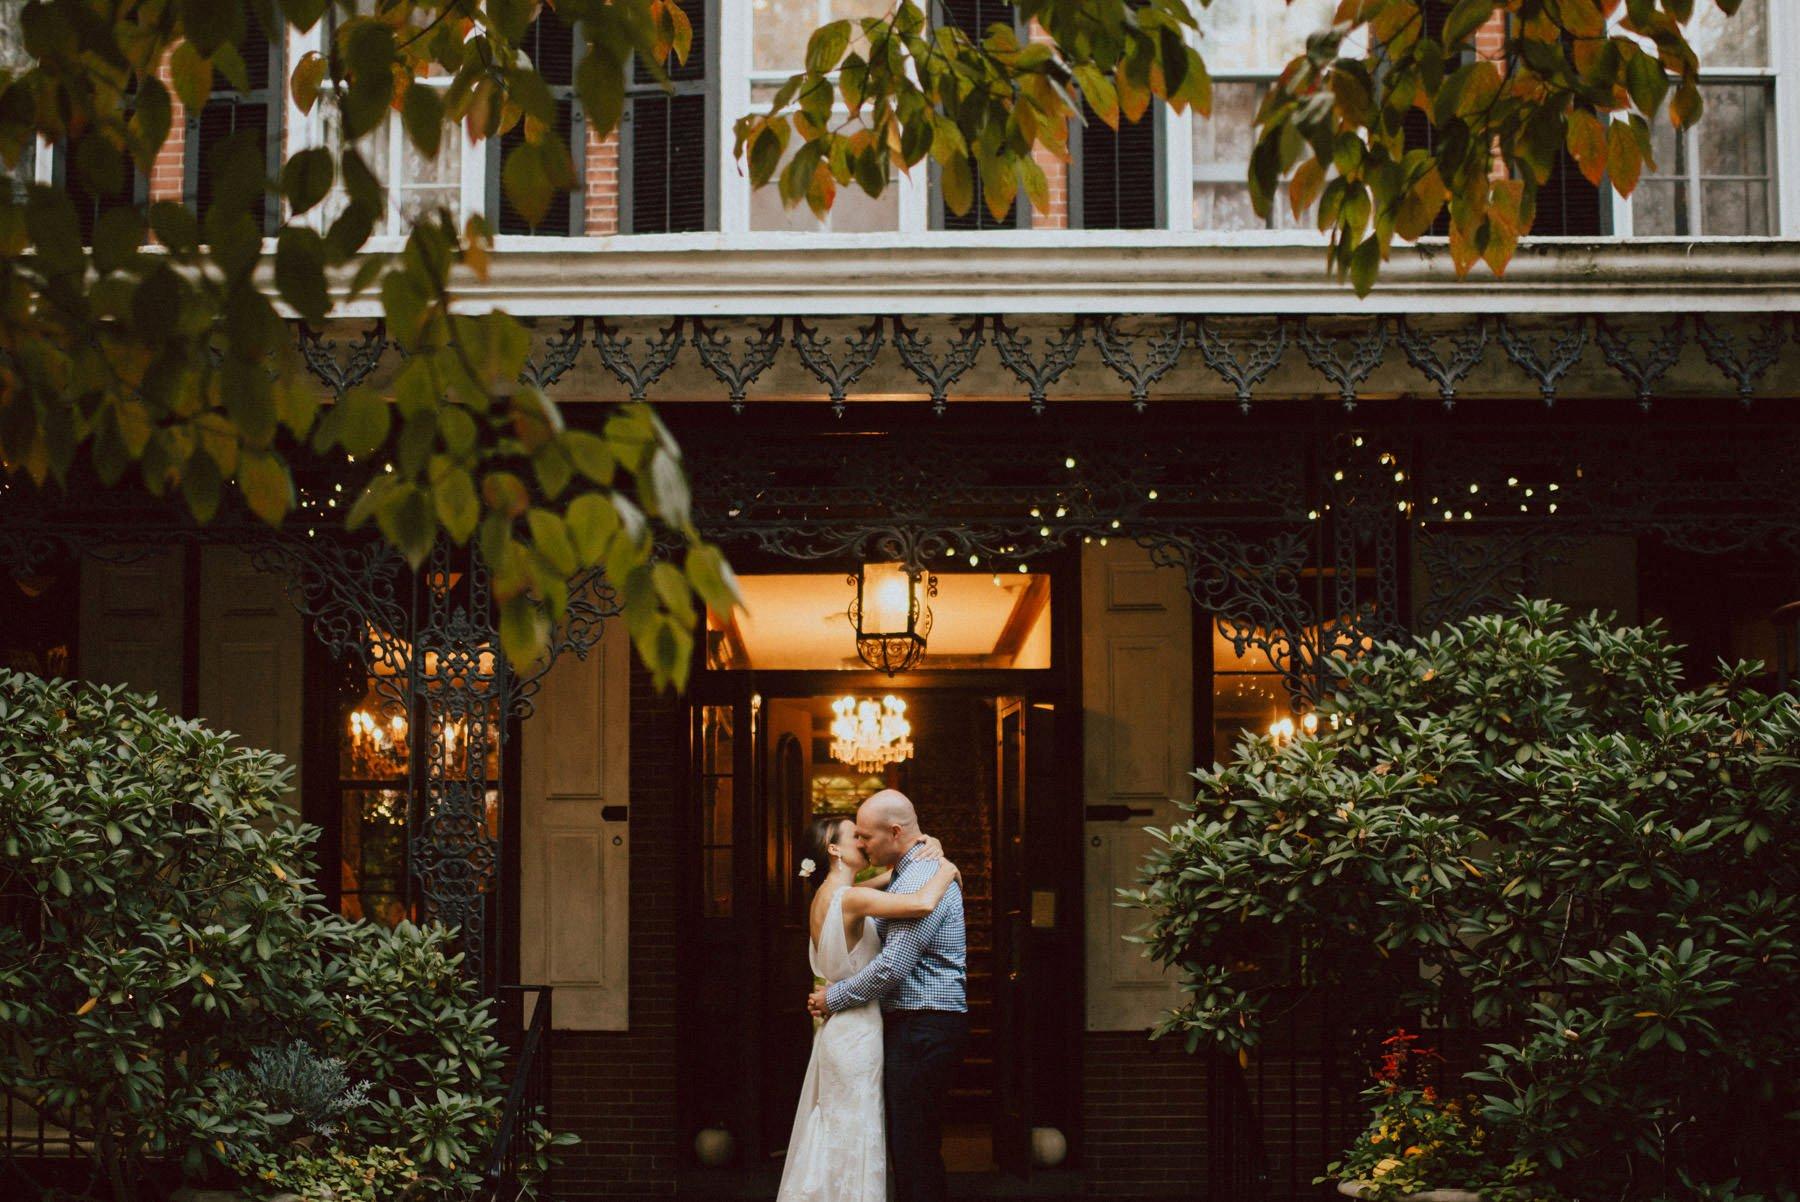 faunbrook-bed-and-breakfast-wedding-106.jpg